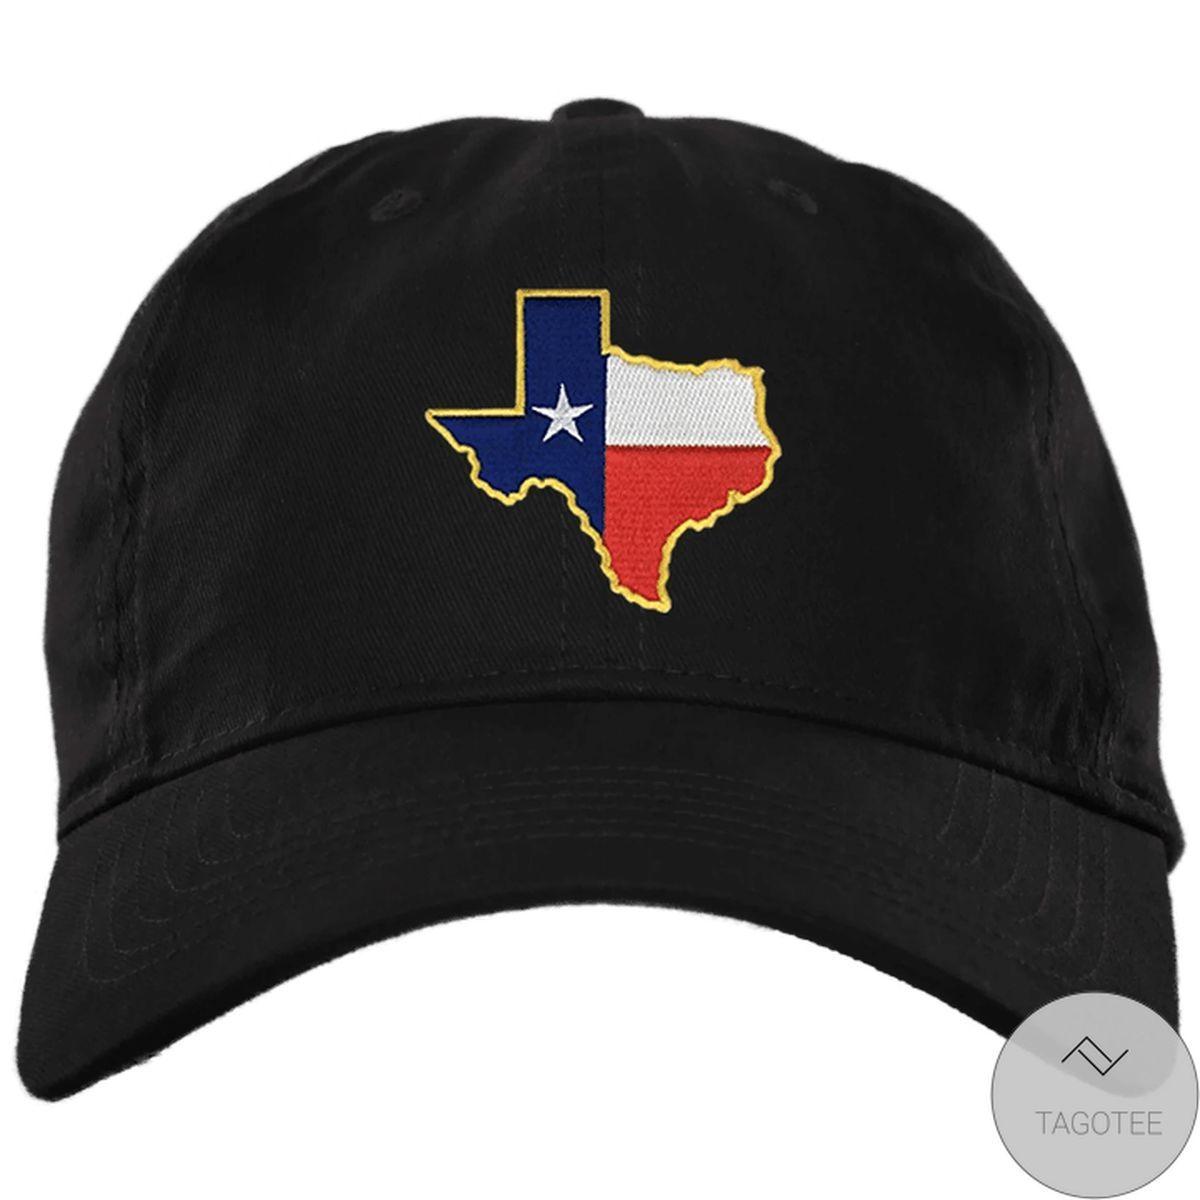 Unique Texas Flag Cap Hat State Of Texas Hat Patriotic Texans Gift Idea For Men Grandfather